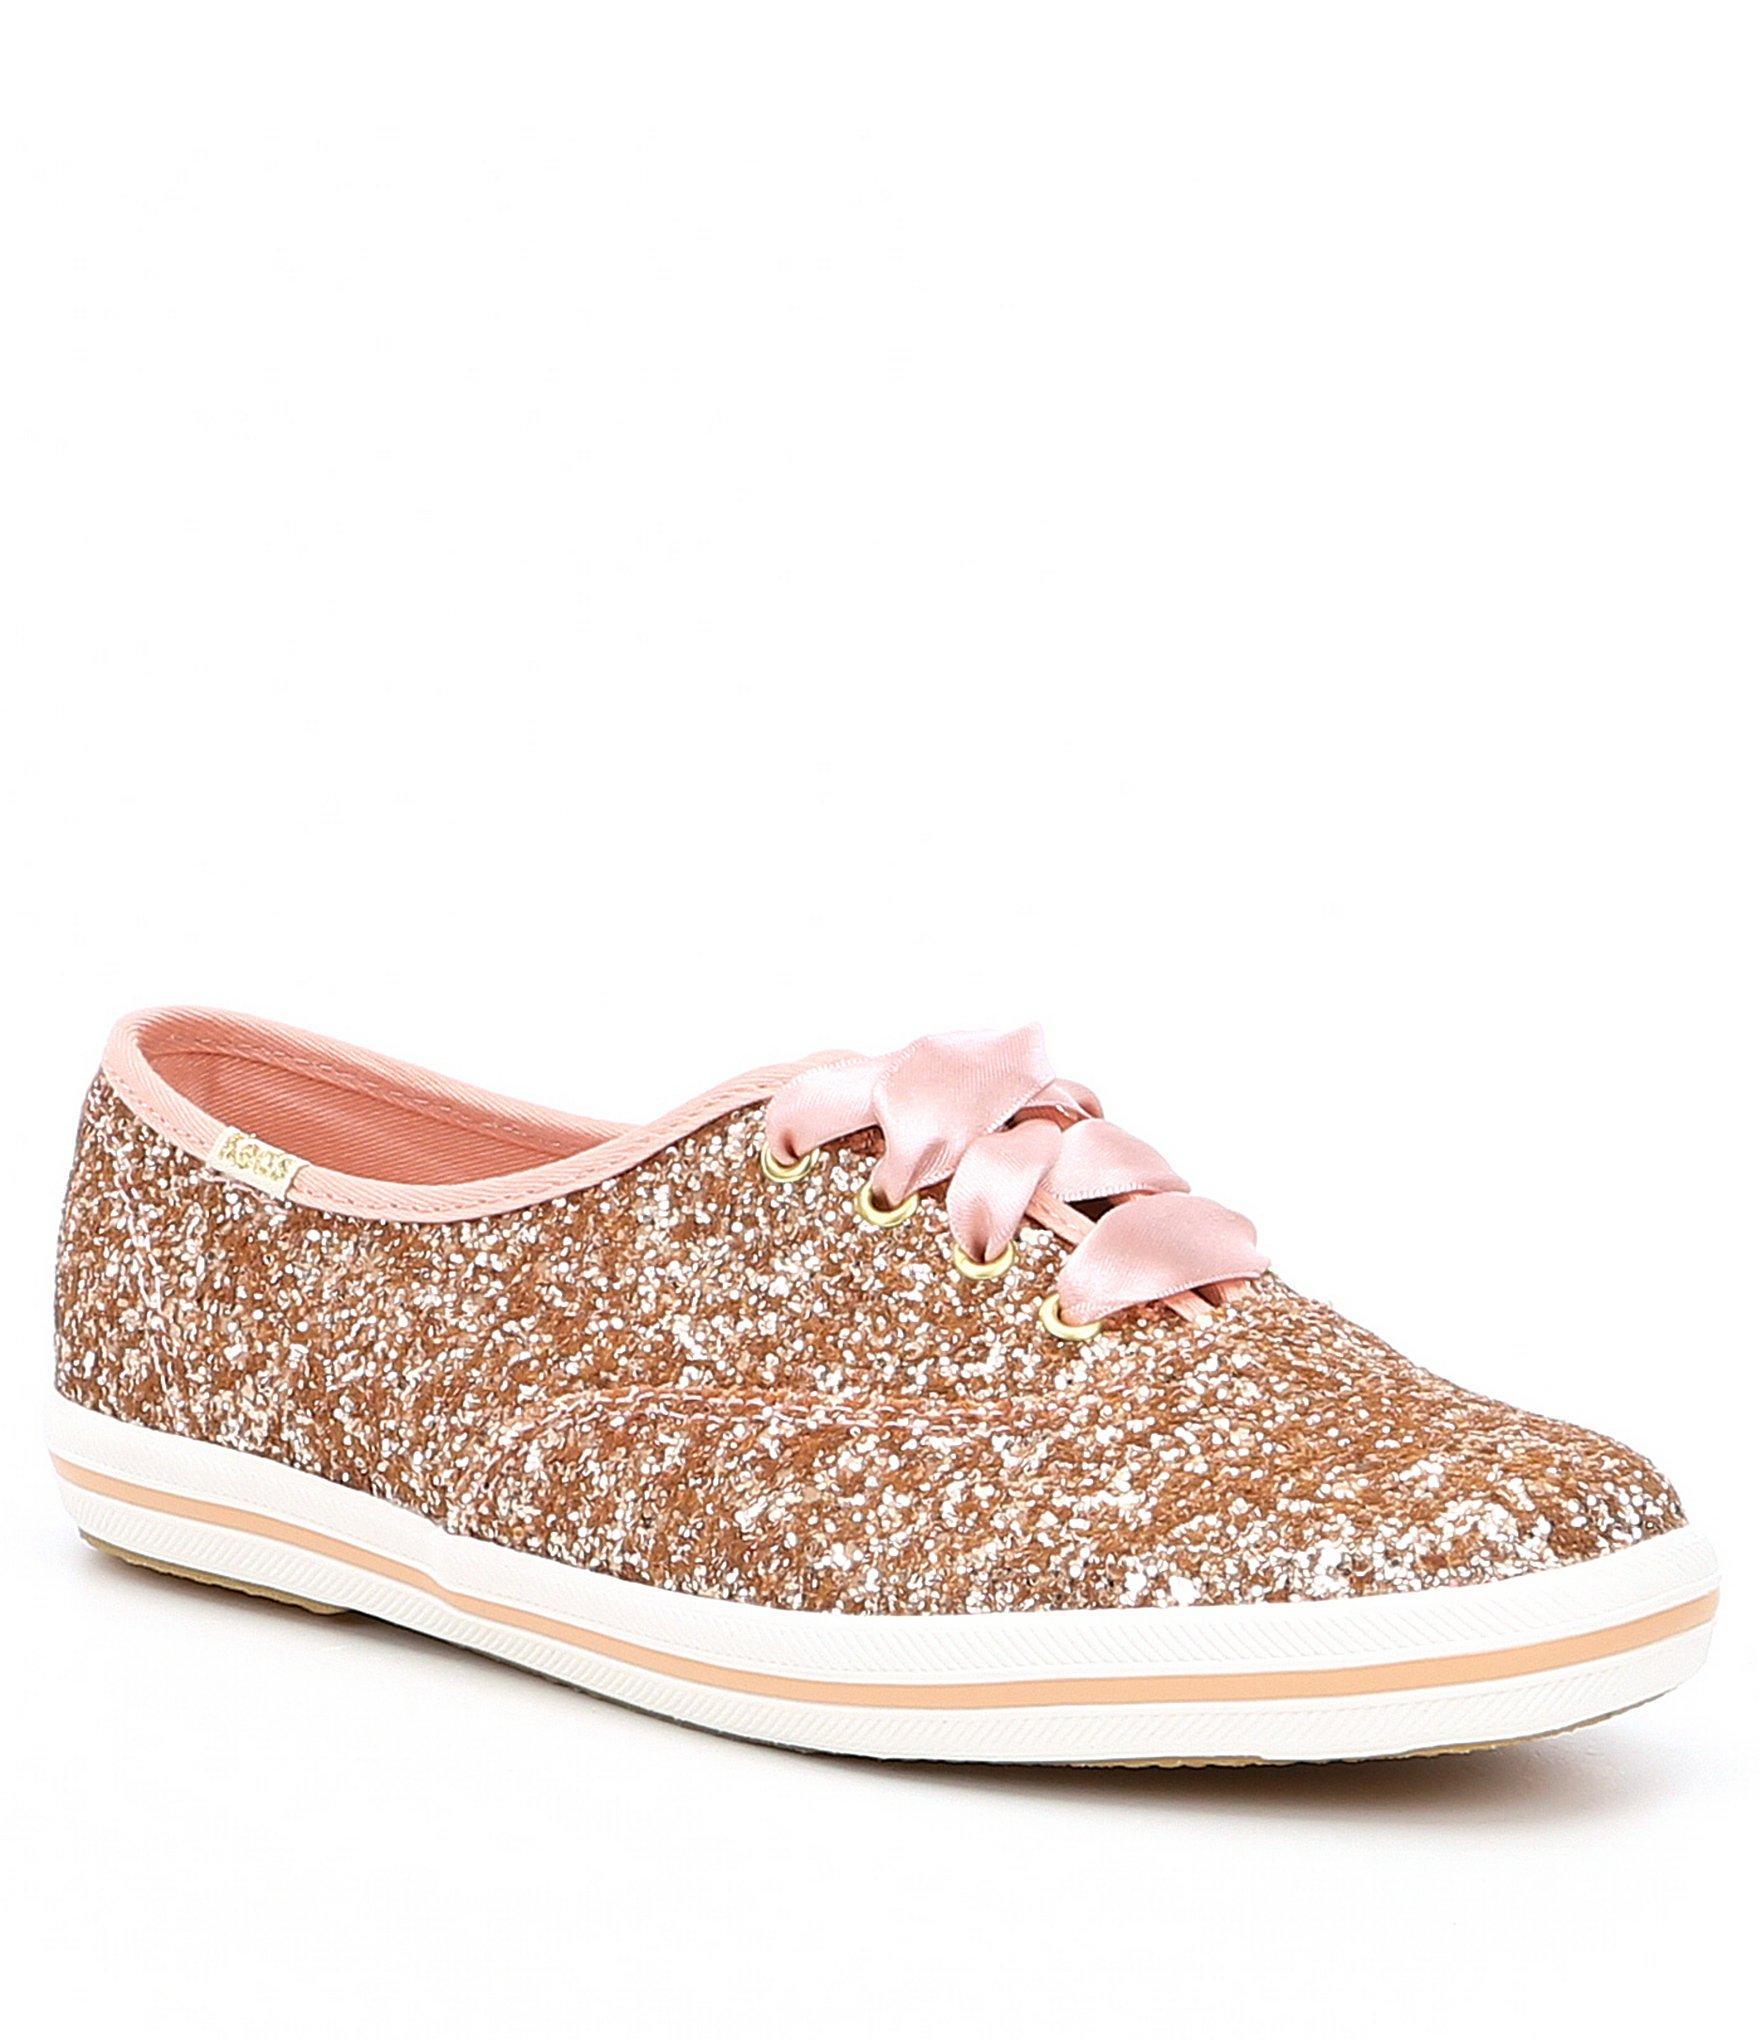 c967126023e6 Lyst - Kate Spade Keds X Glitter Keds Sneakers in Metallic